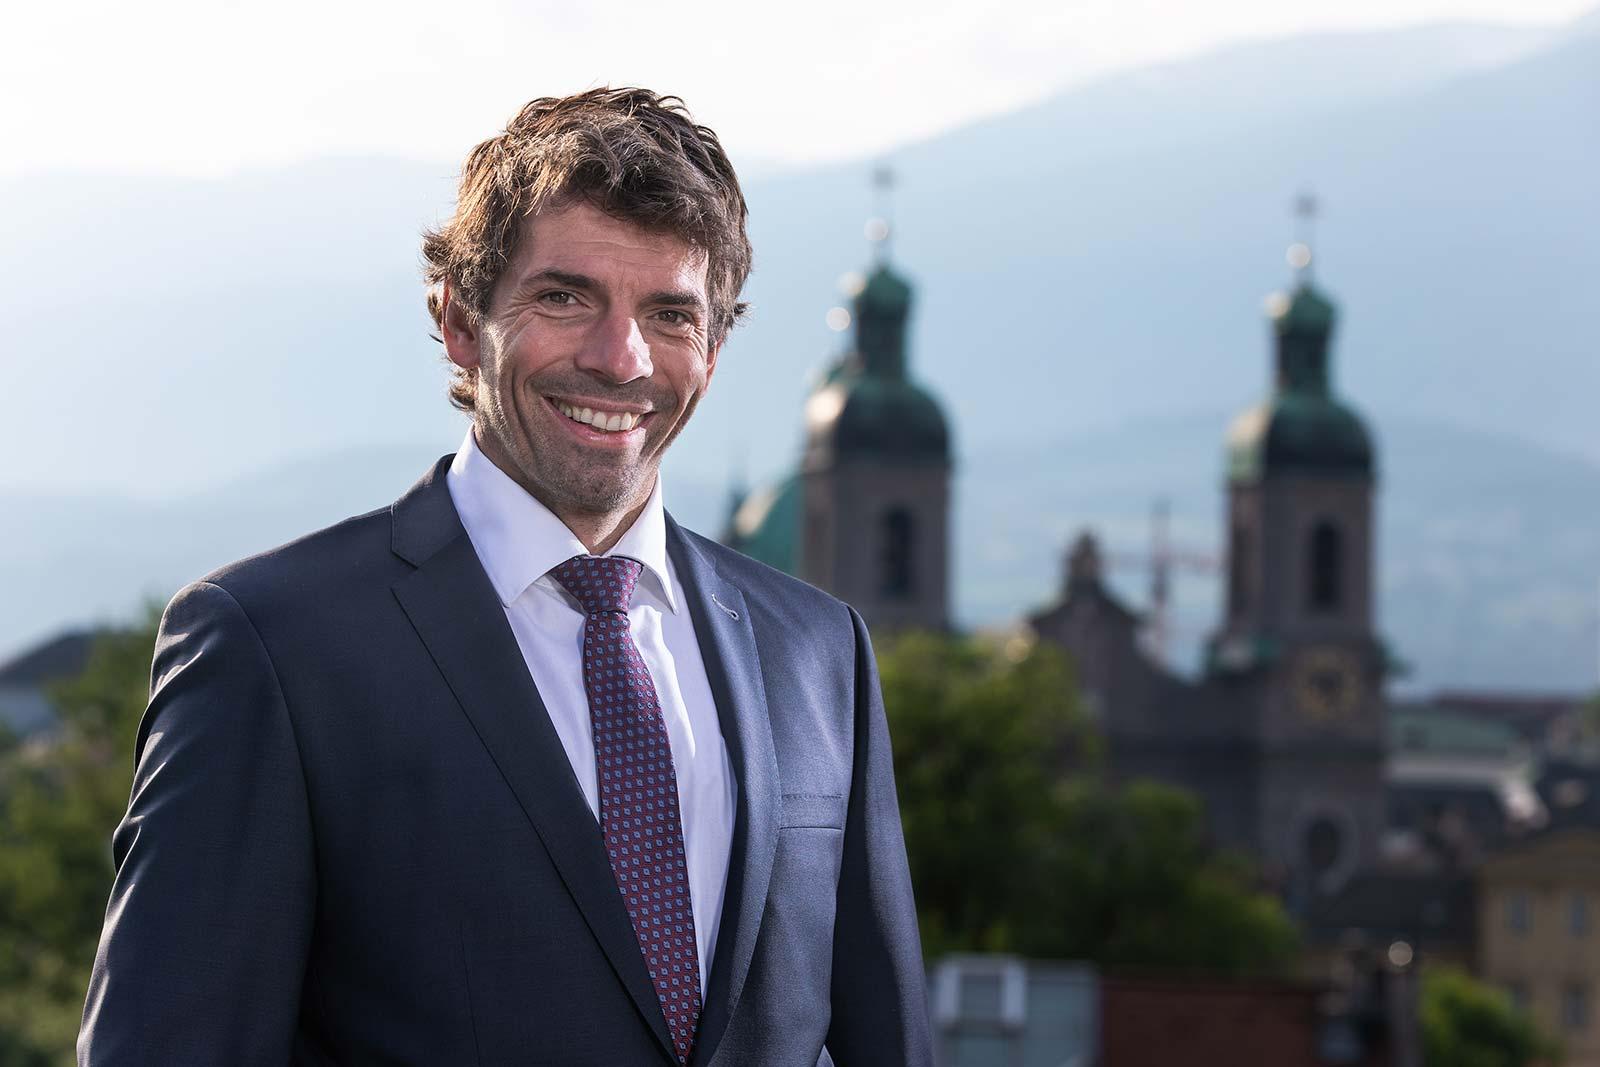 Mag. Ulrich Ortner | Fuchs Wenzel Ortner Richter Rechtsanwälte, 6020 Innsbruck